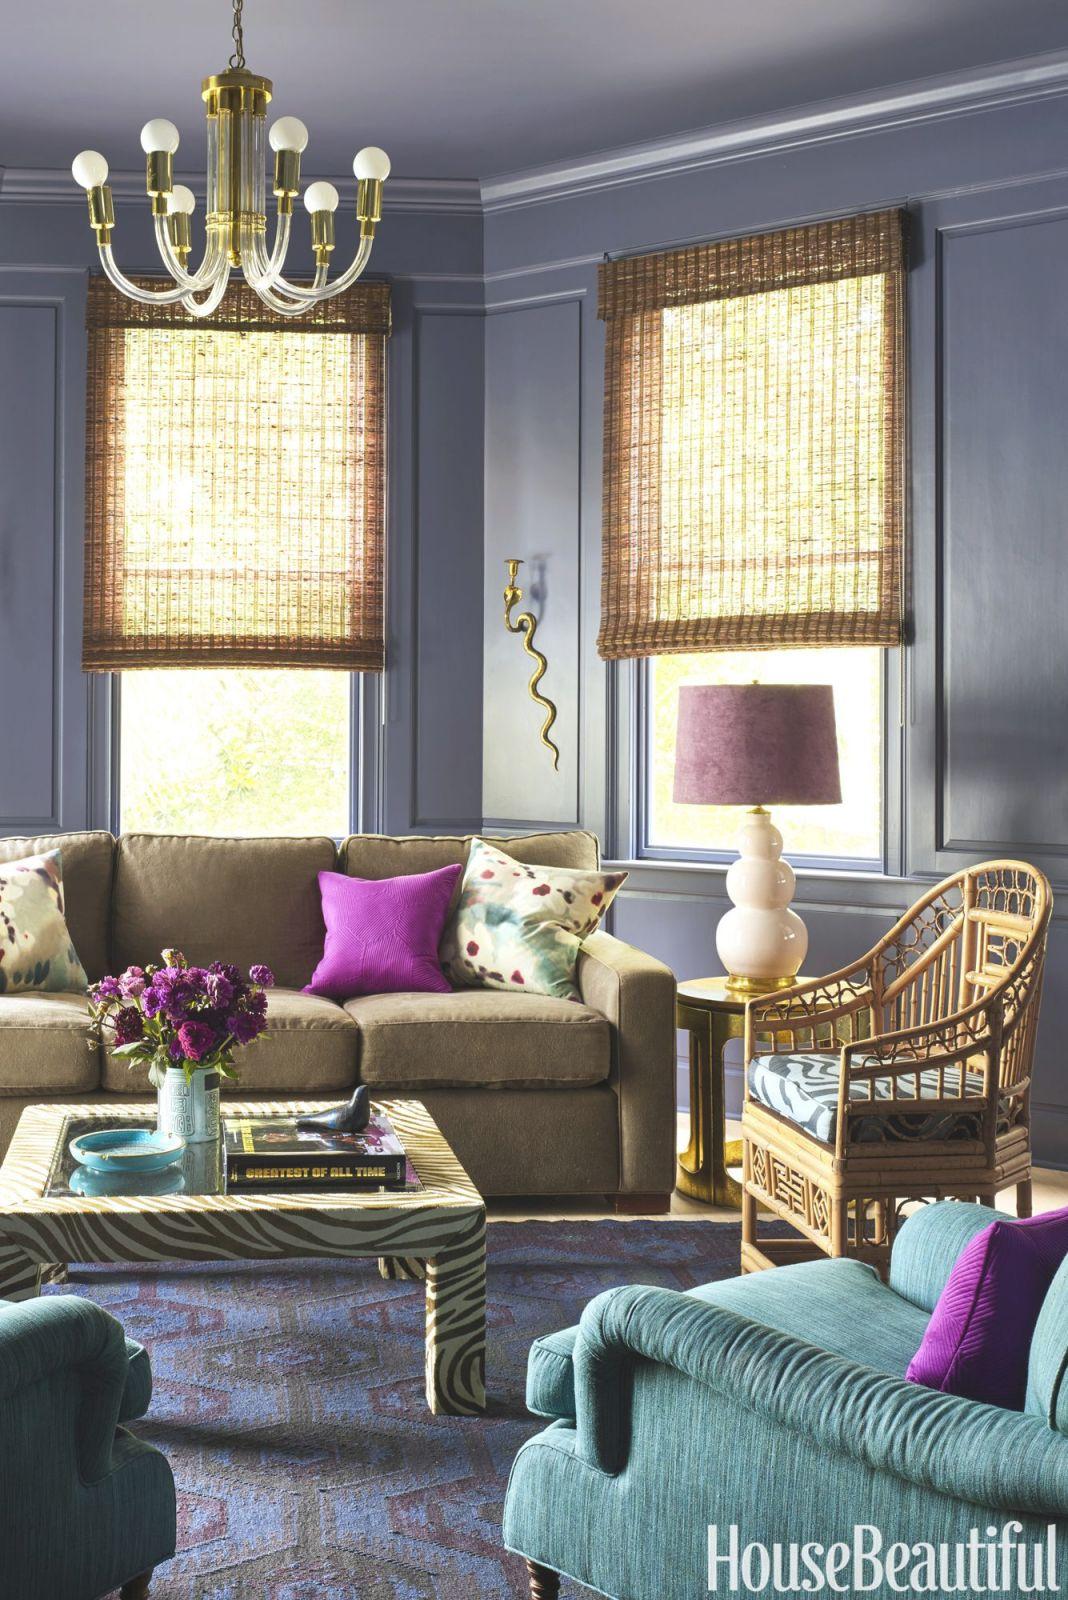 13 unique ideas for purple and green living room decor